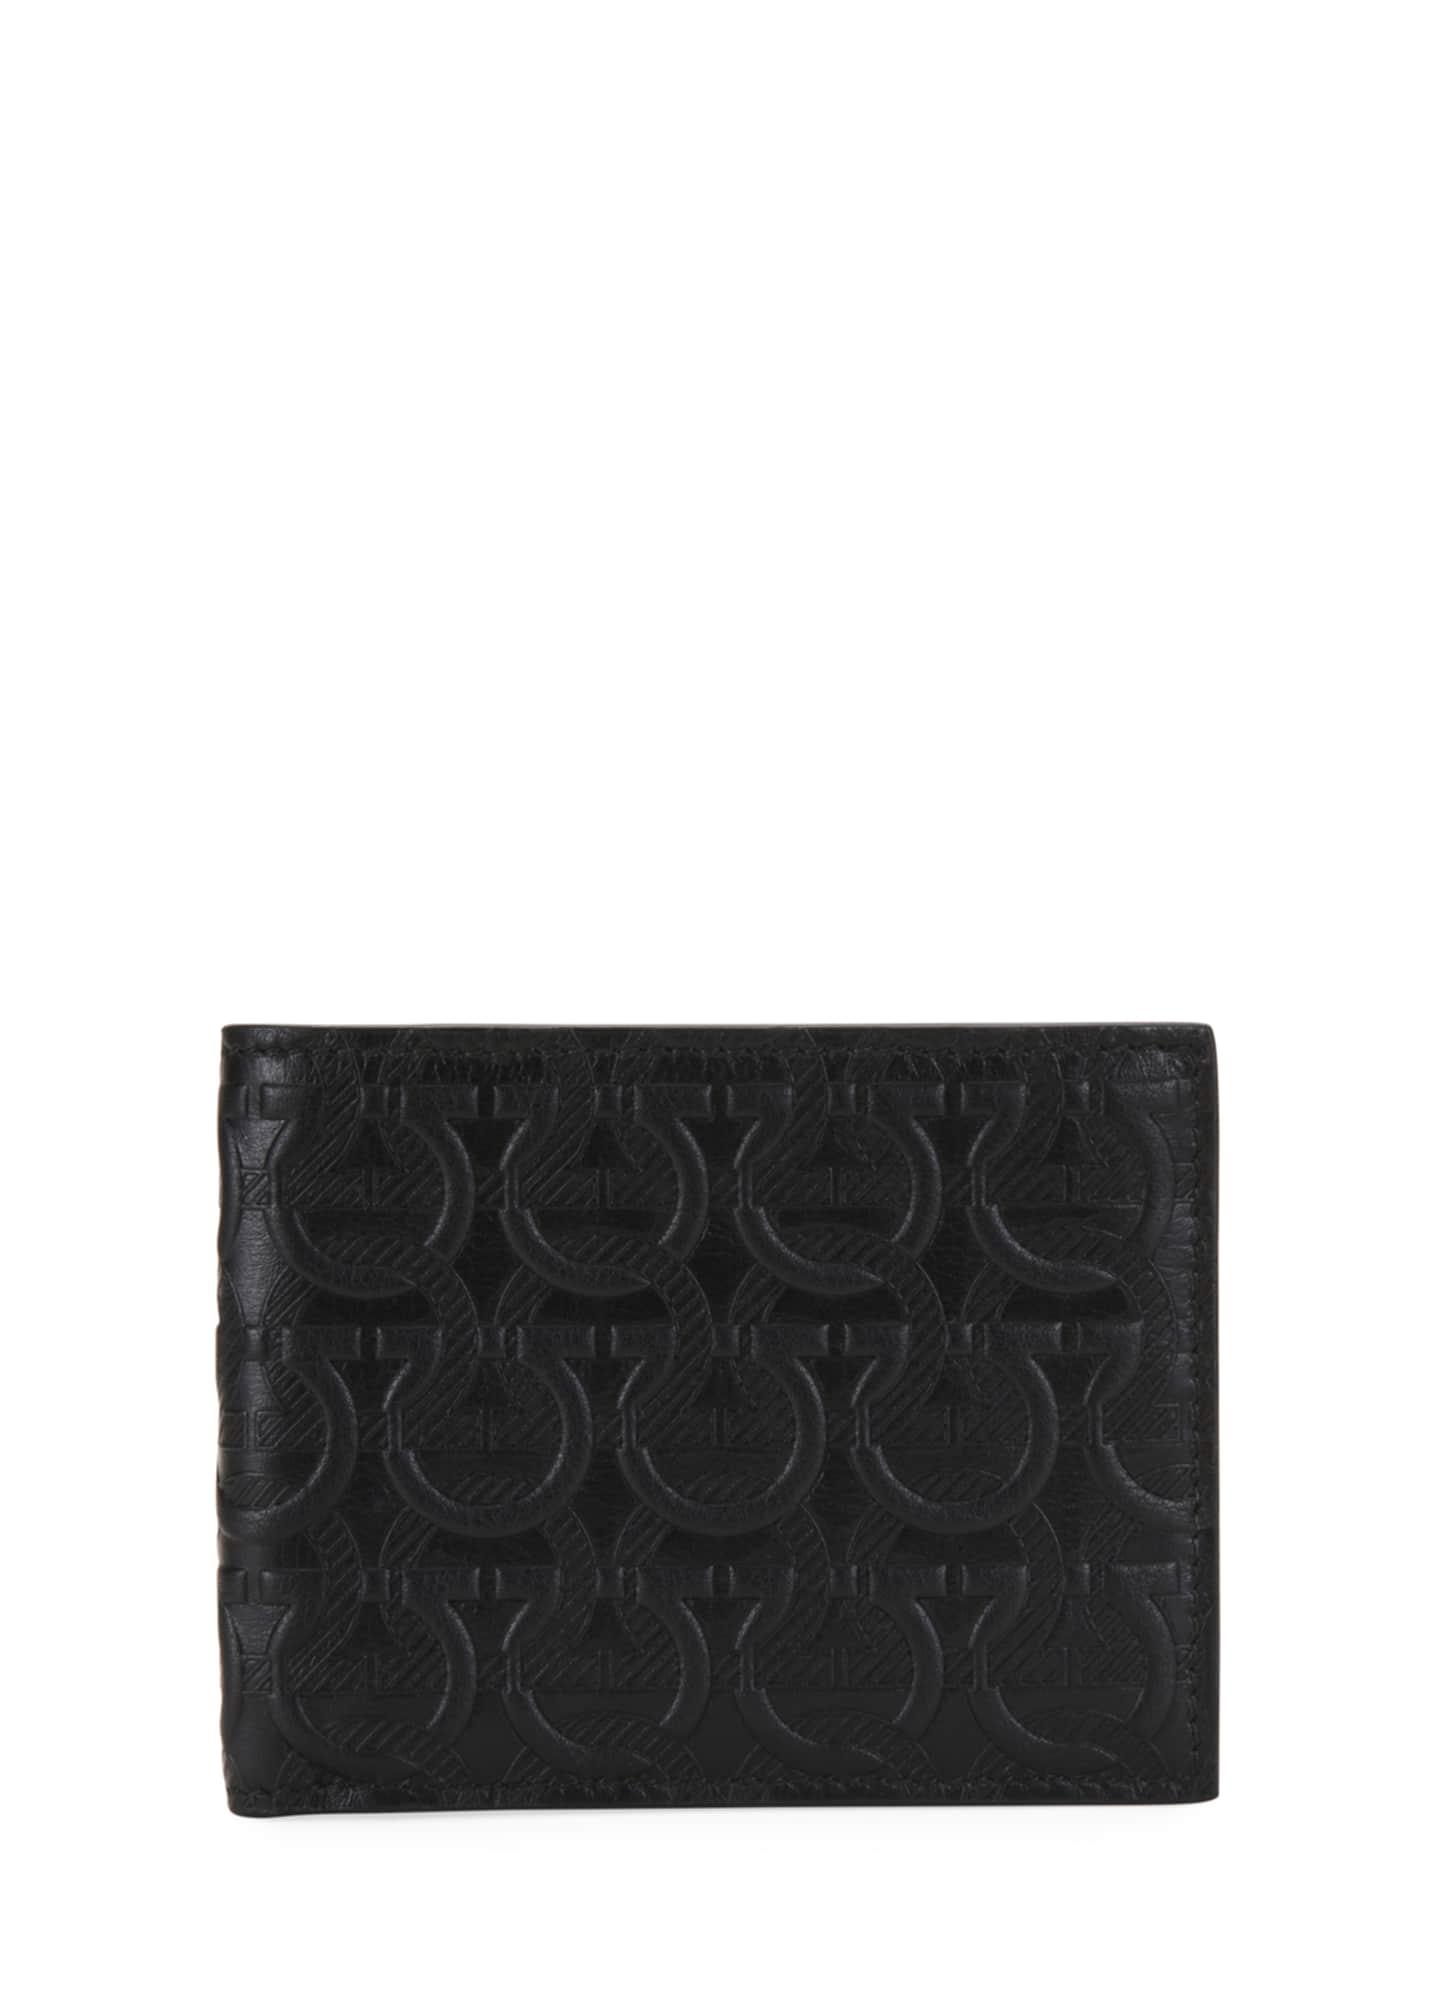 Salvatore Ferragamo Men's Gancini-Print Leather Wallet